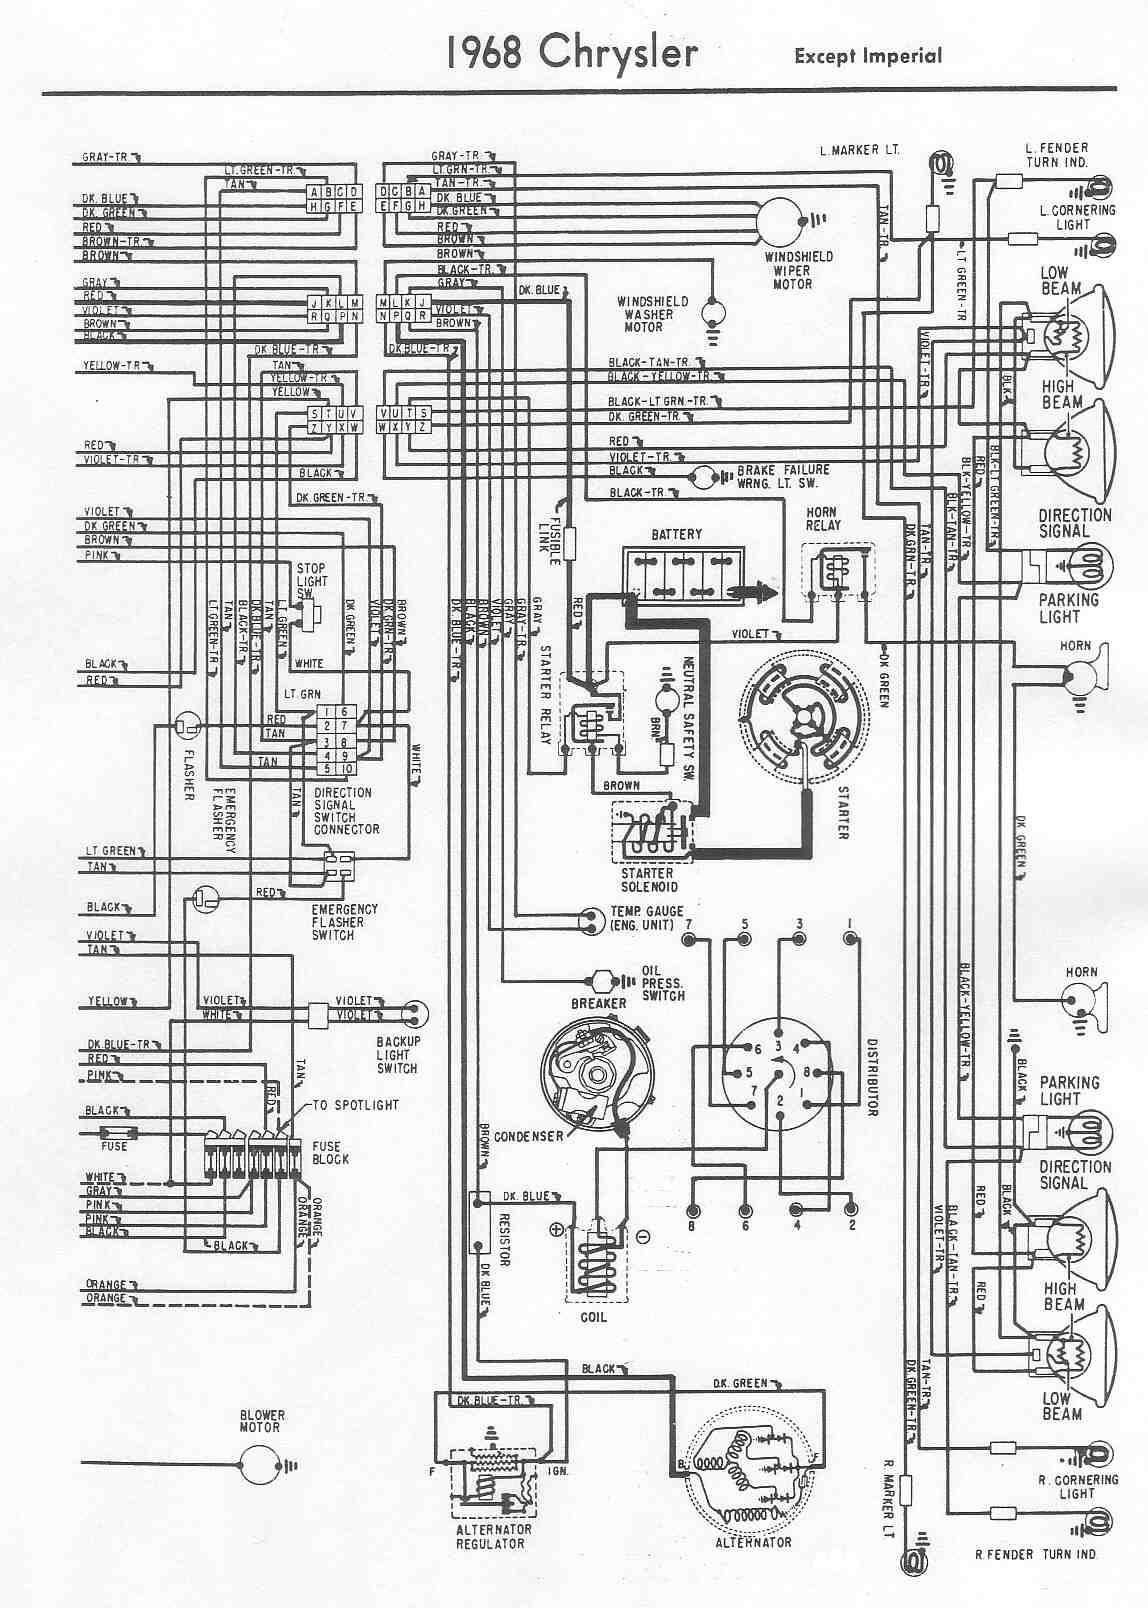 hight resolution of 429 cadillac engine diagram free download wiring diagram schematic1968 cadillac engine diagram 6 stromoeko de u2022